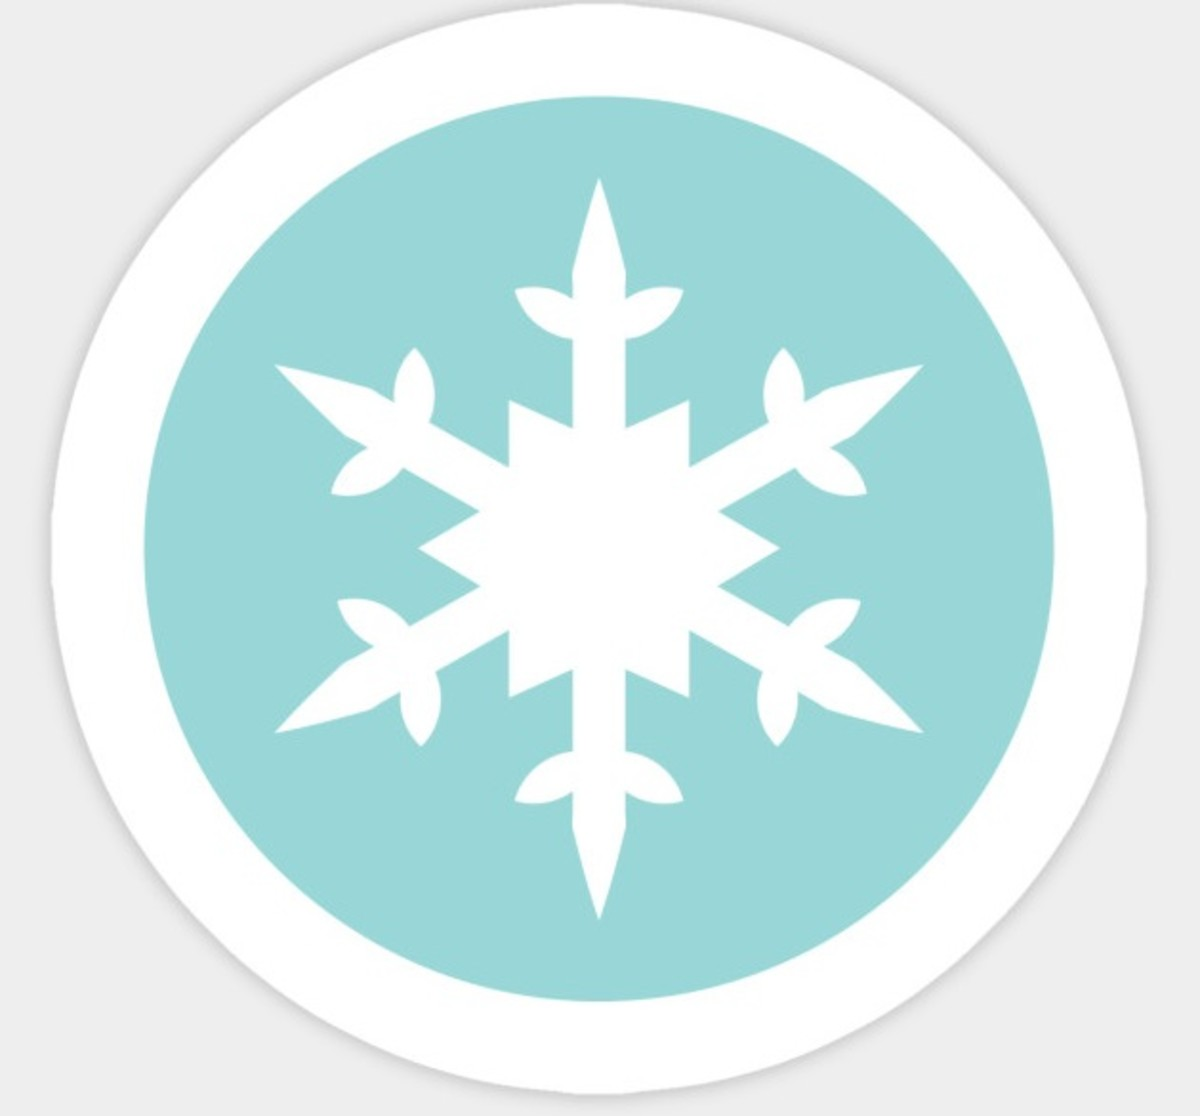 Ice Pokémon logo